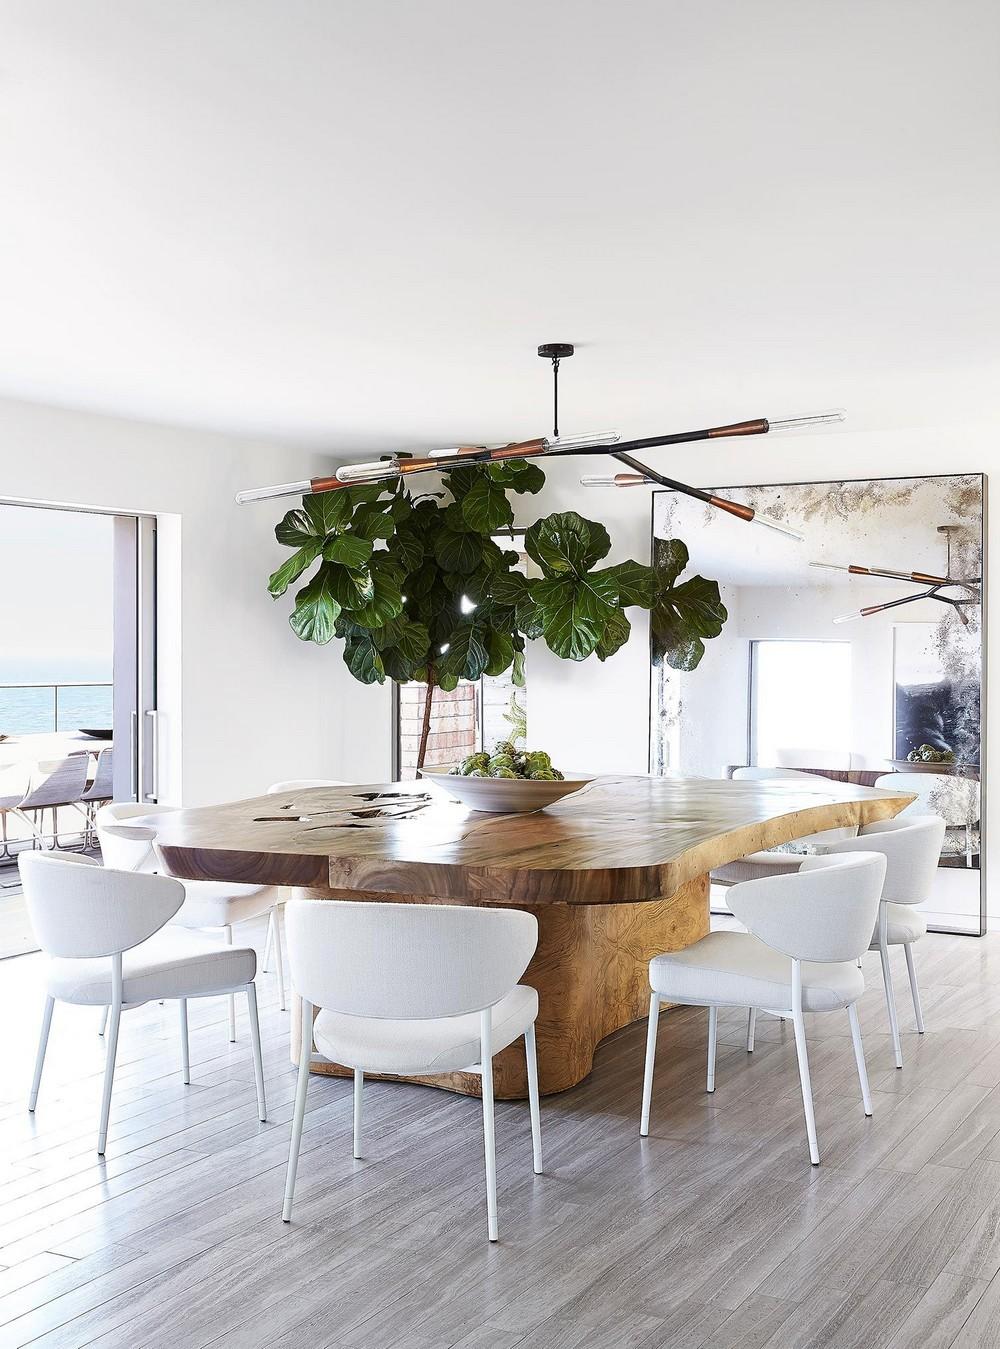 Jamie Bush: Modern Dining Rooms For Luxury Homes jamie bush Jamie Bush: Modern Dining Rooms For Luxury Homes 2 Pinterest